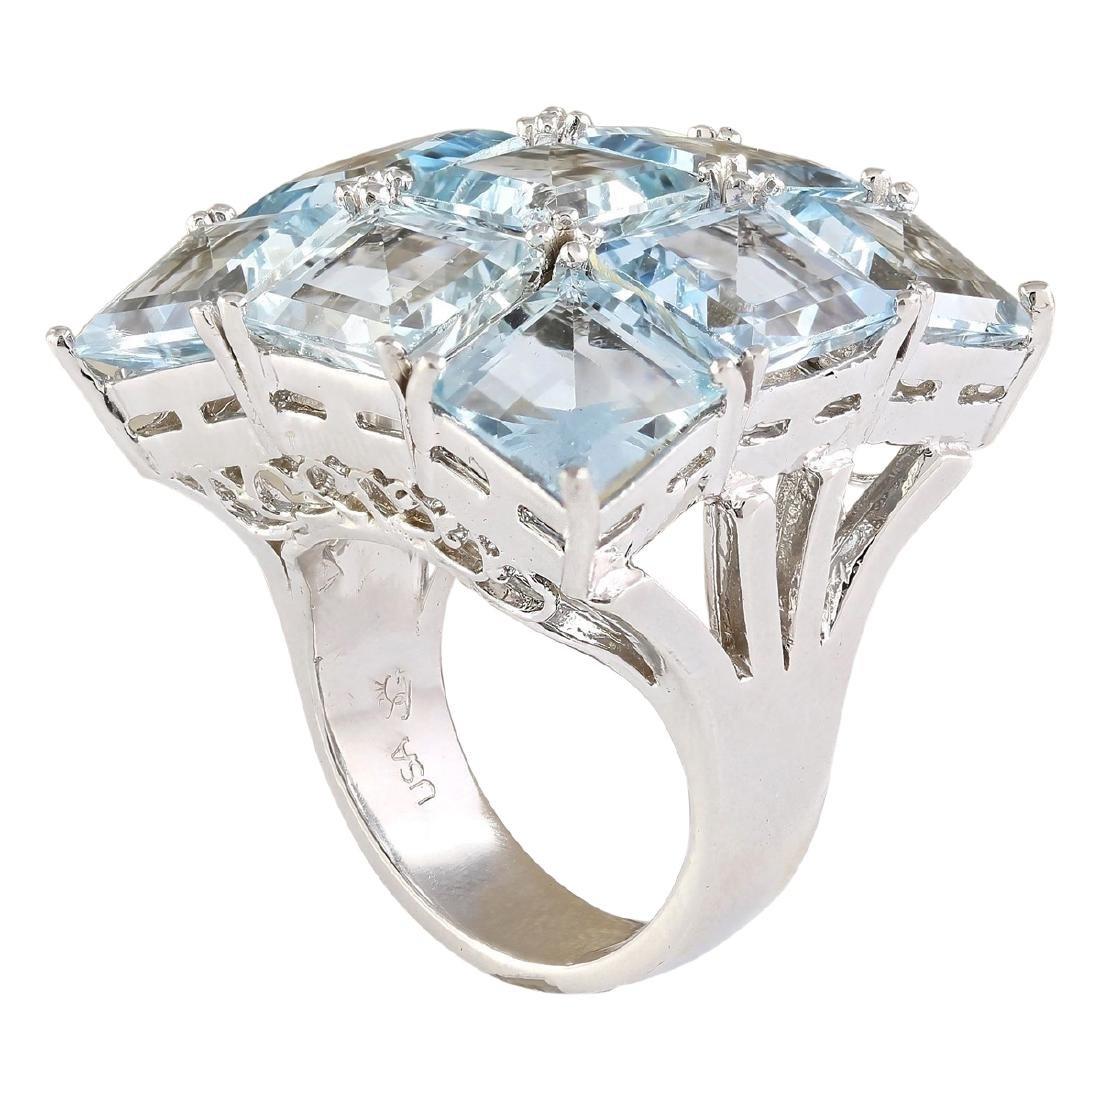 20.00 CTW Natural Aquamarine Ring In 18K White Gold - 3